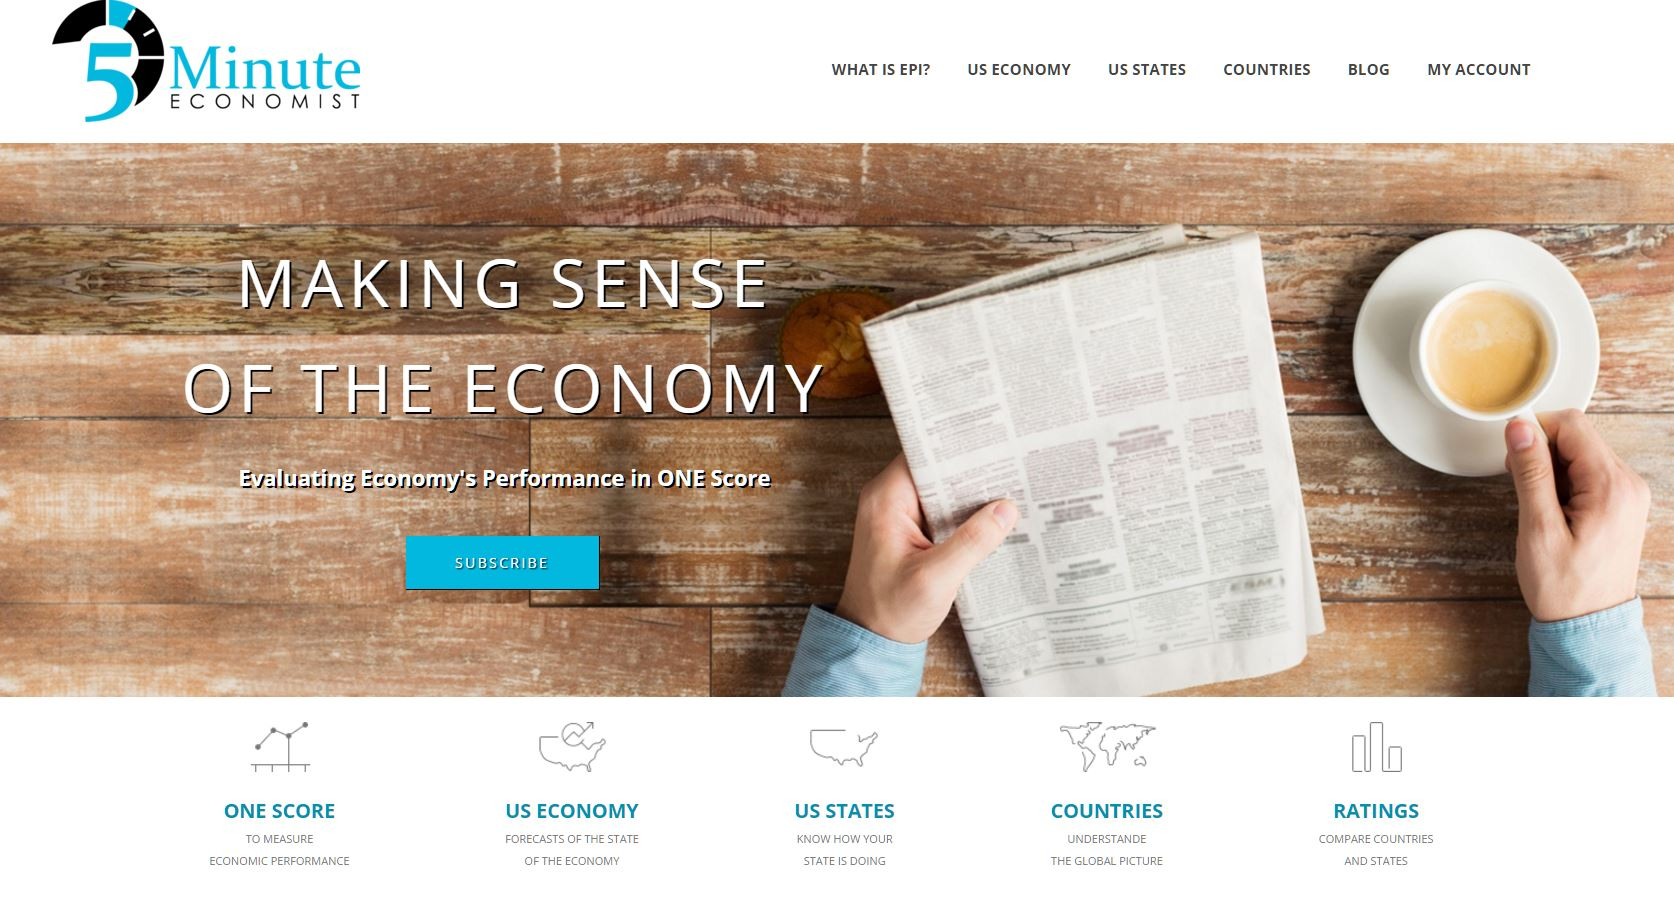 5MinuteEconomist.com